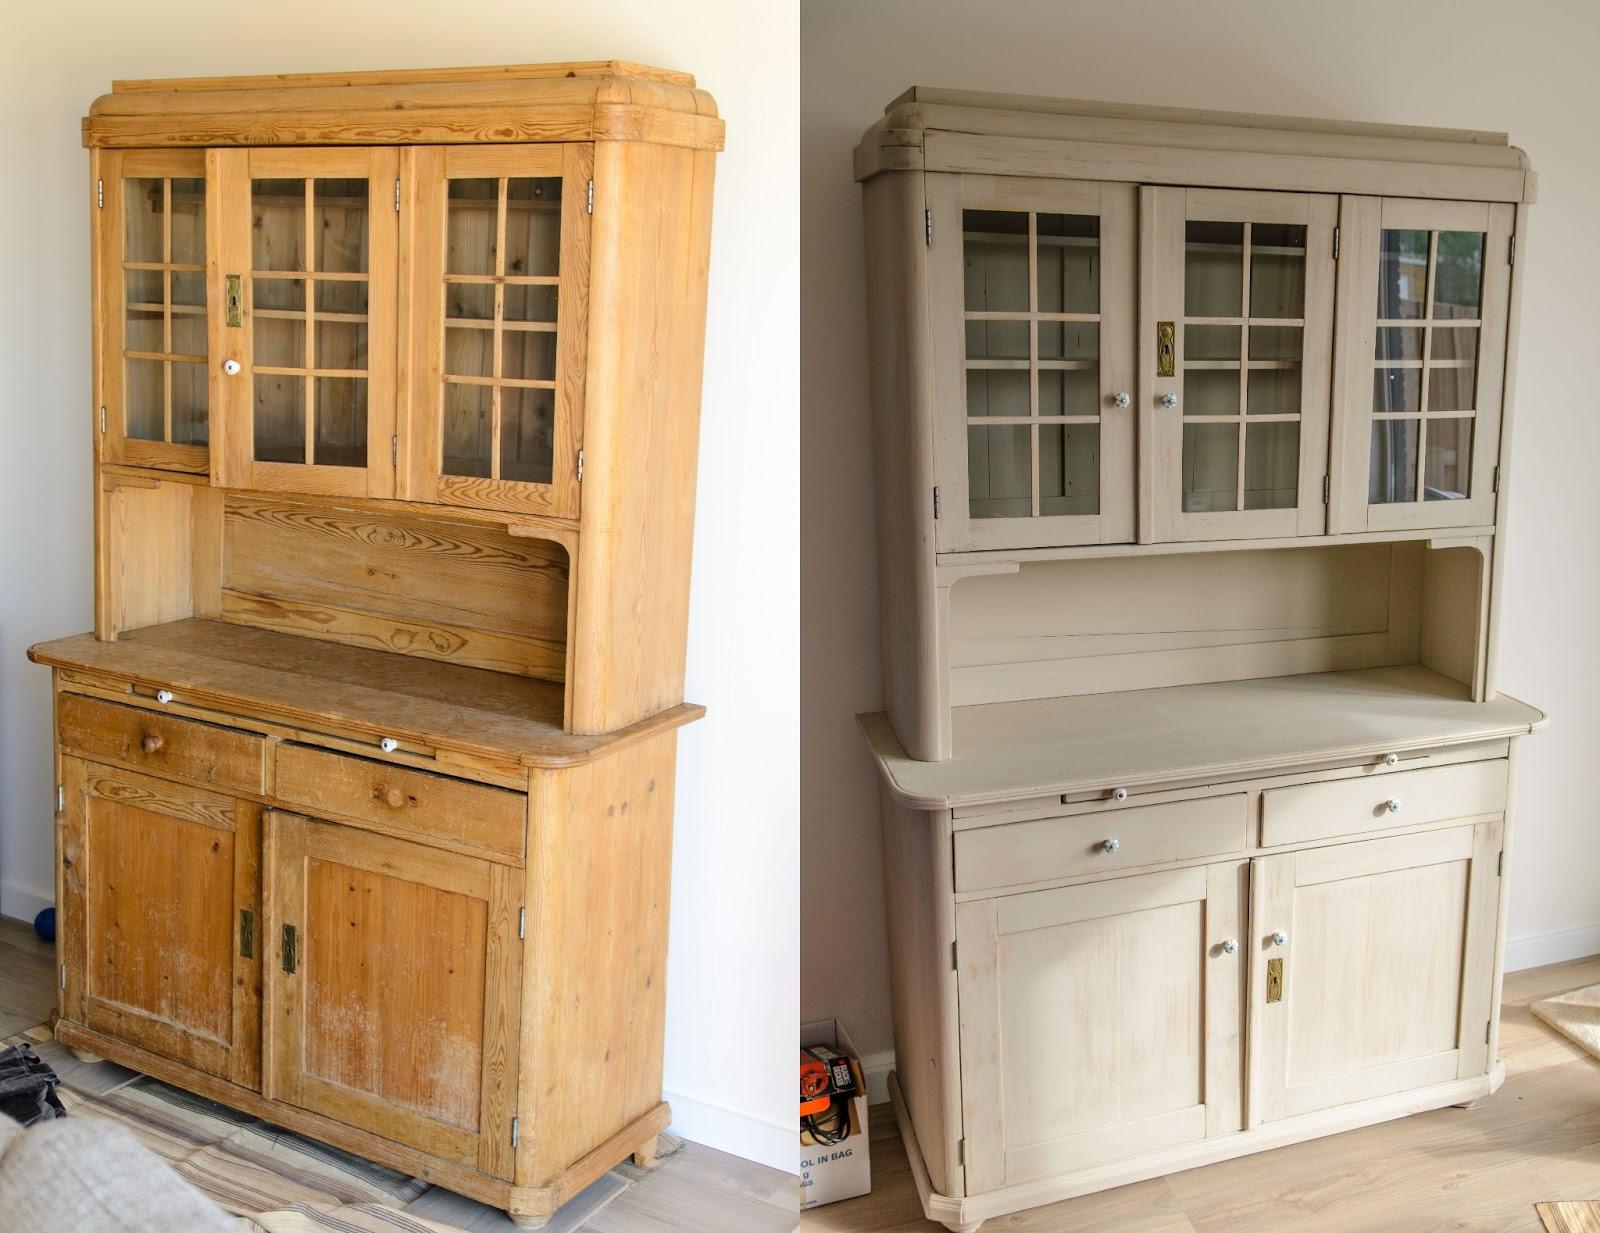 Meubels Wit Verven : Beroemd grenen meubels wit verven az u blessingbox